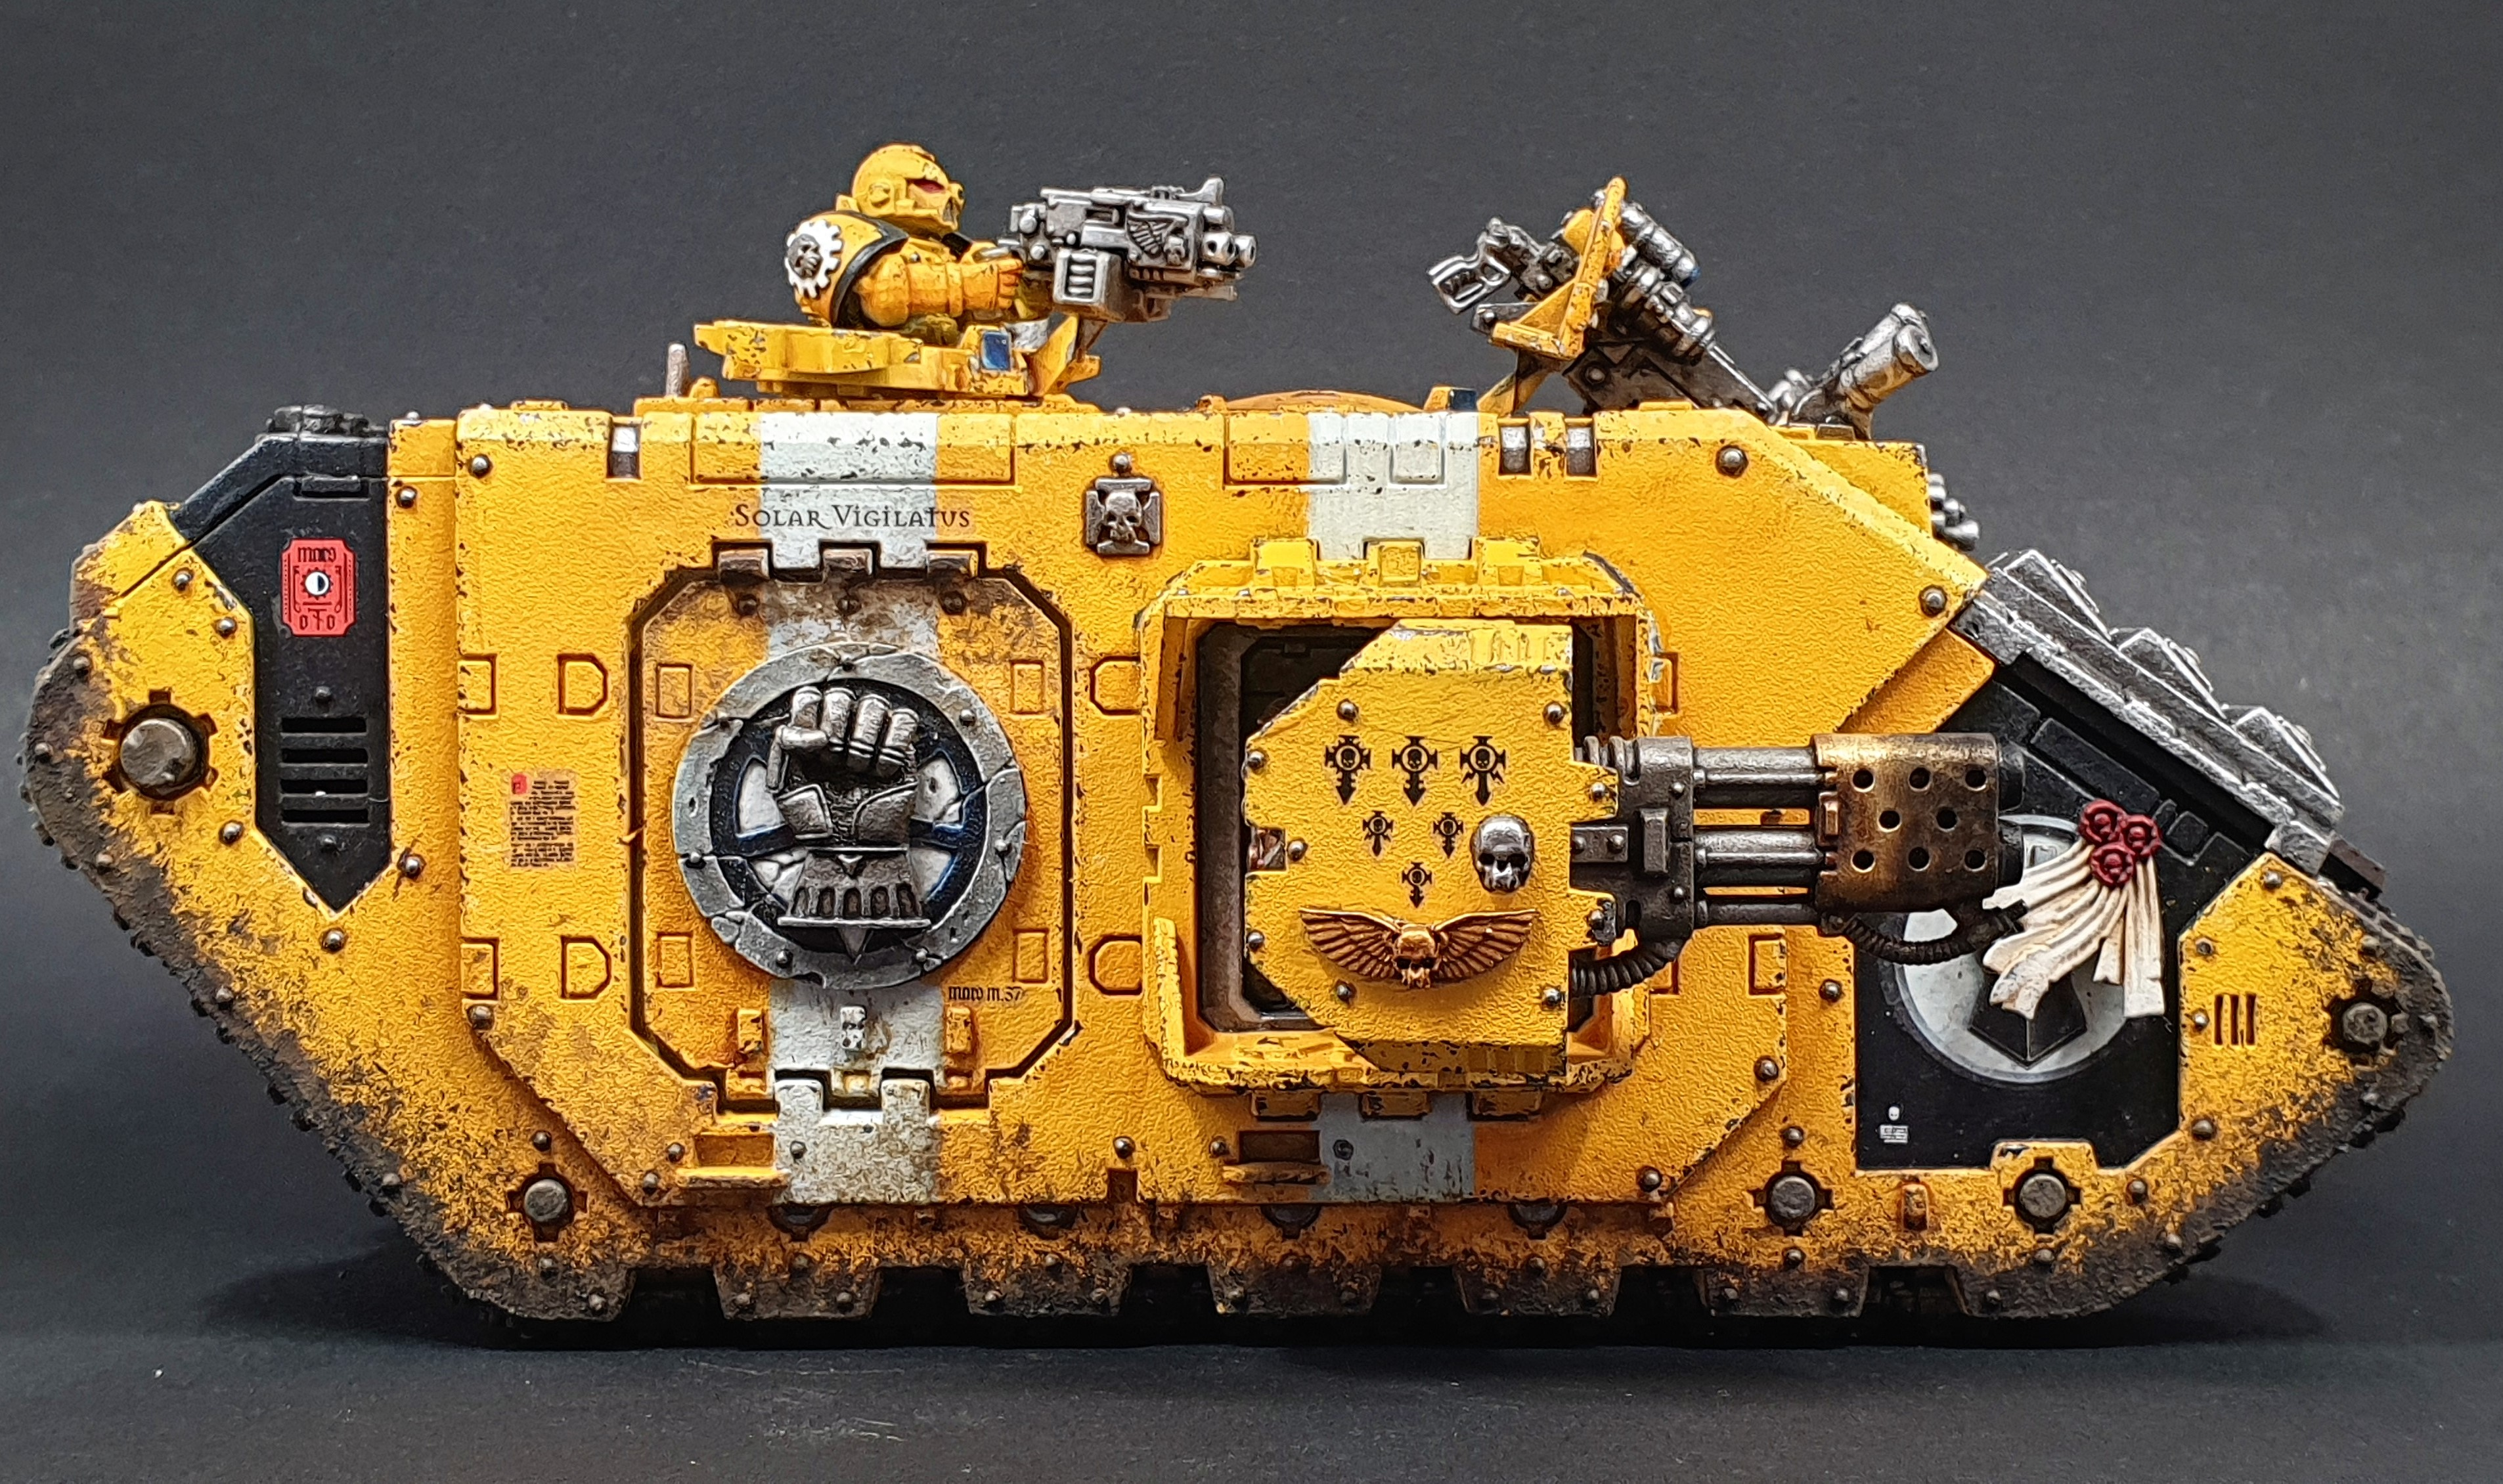 Imperial Fists Land Raider Crusder